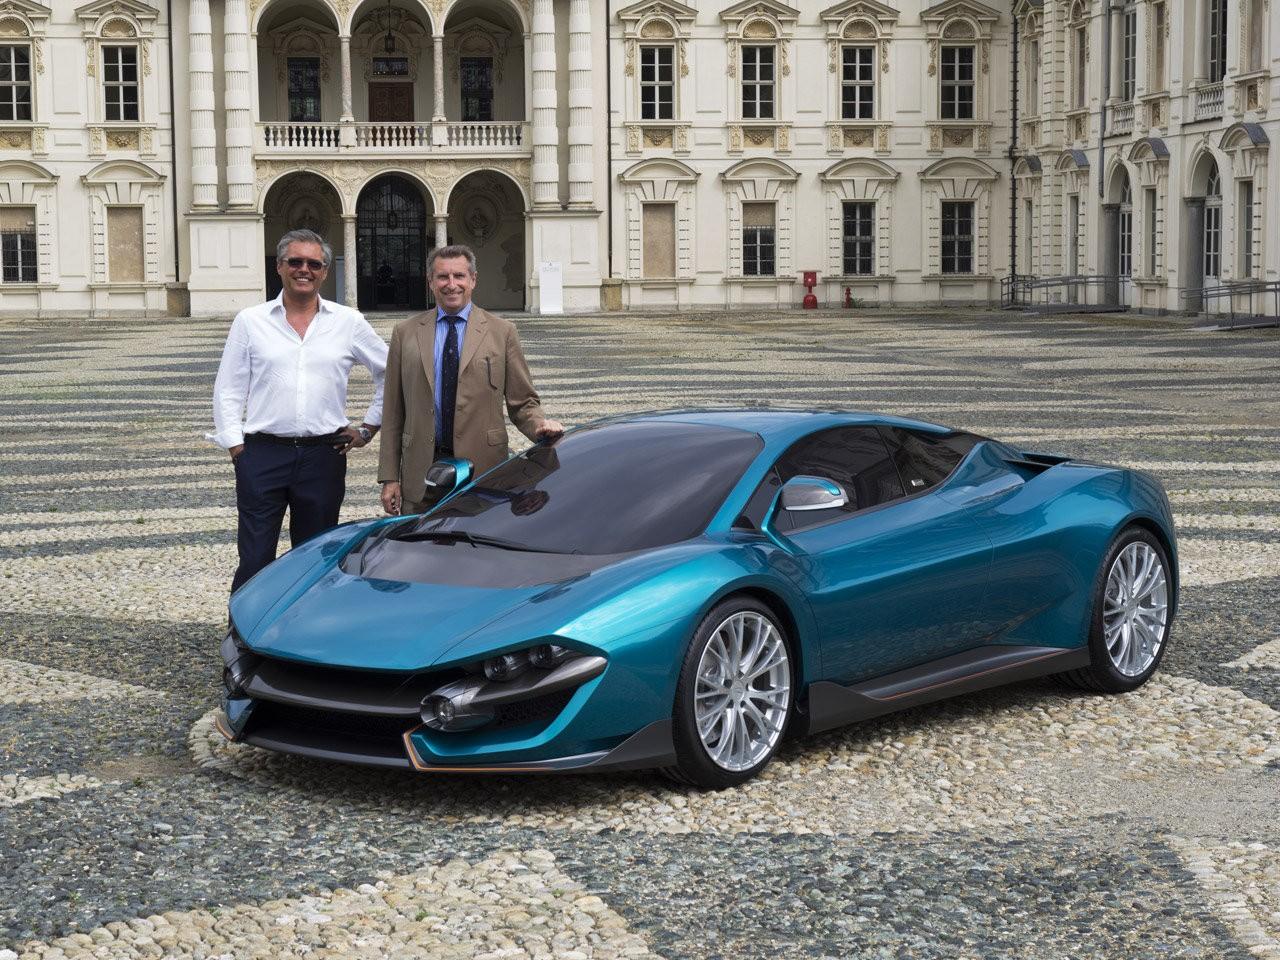 Torino Design ATS Wildtwelve Concept revealed at Parco Valentino